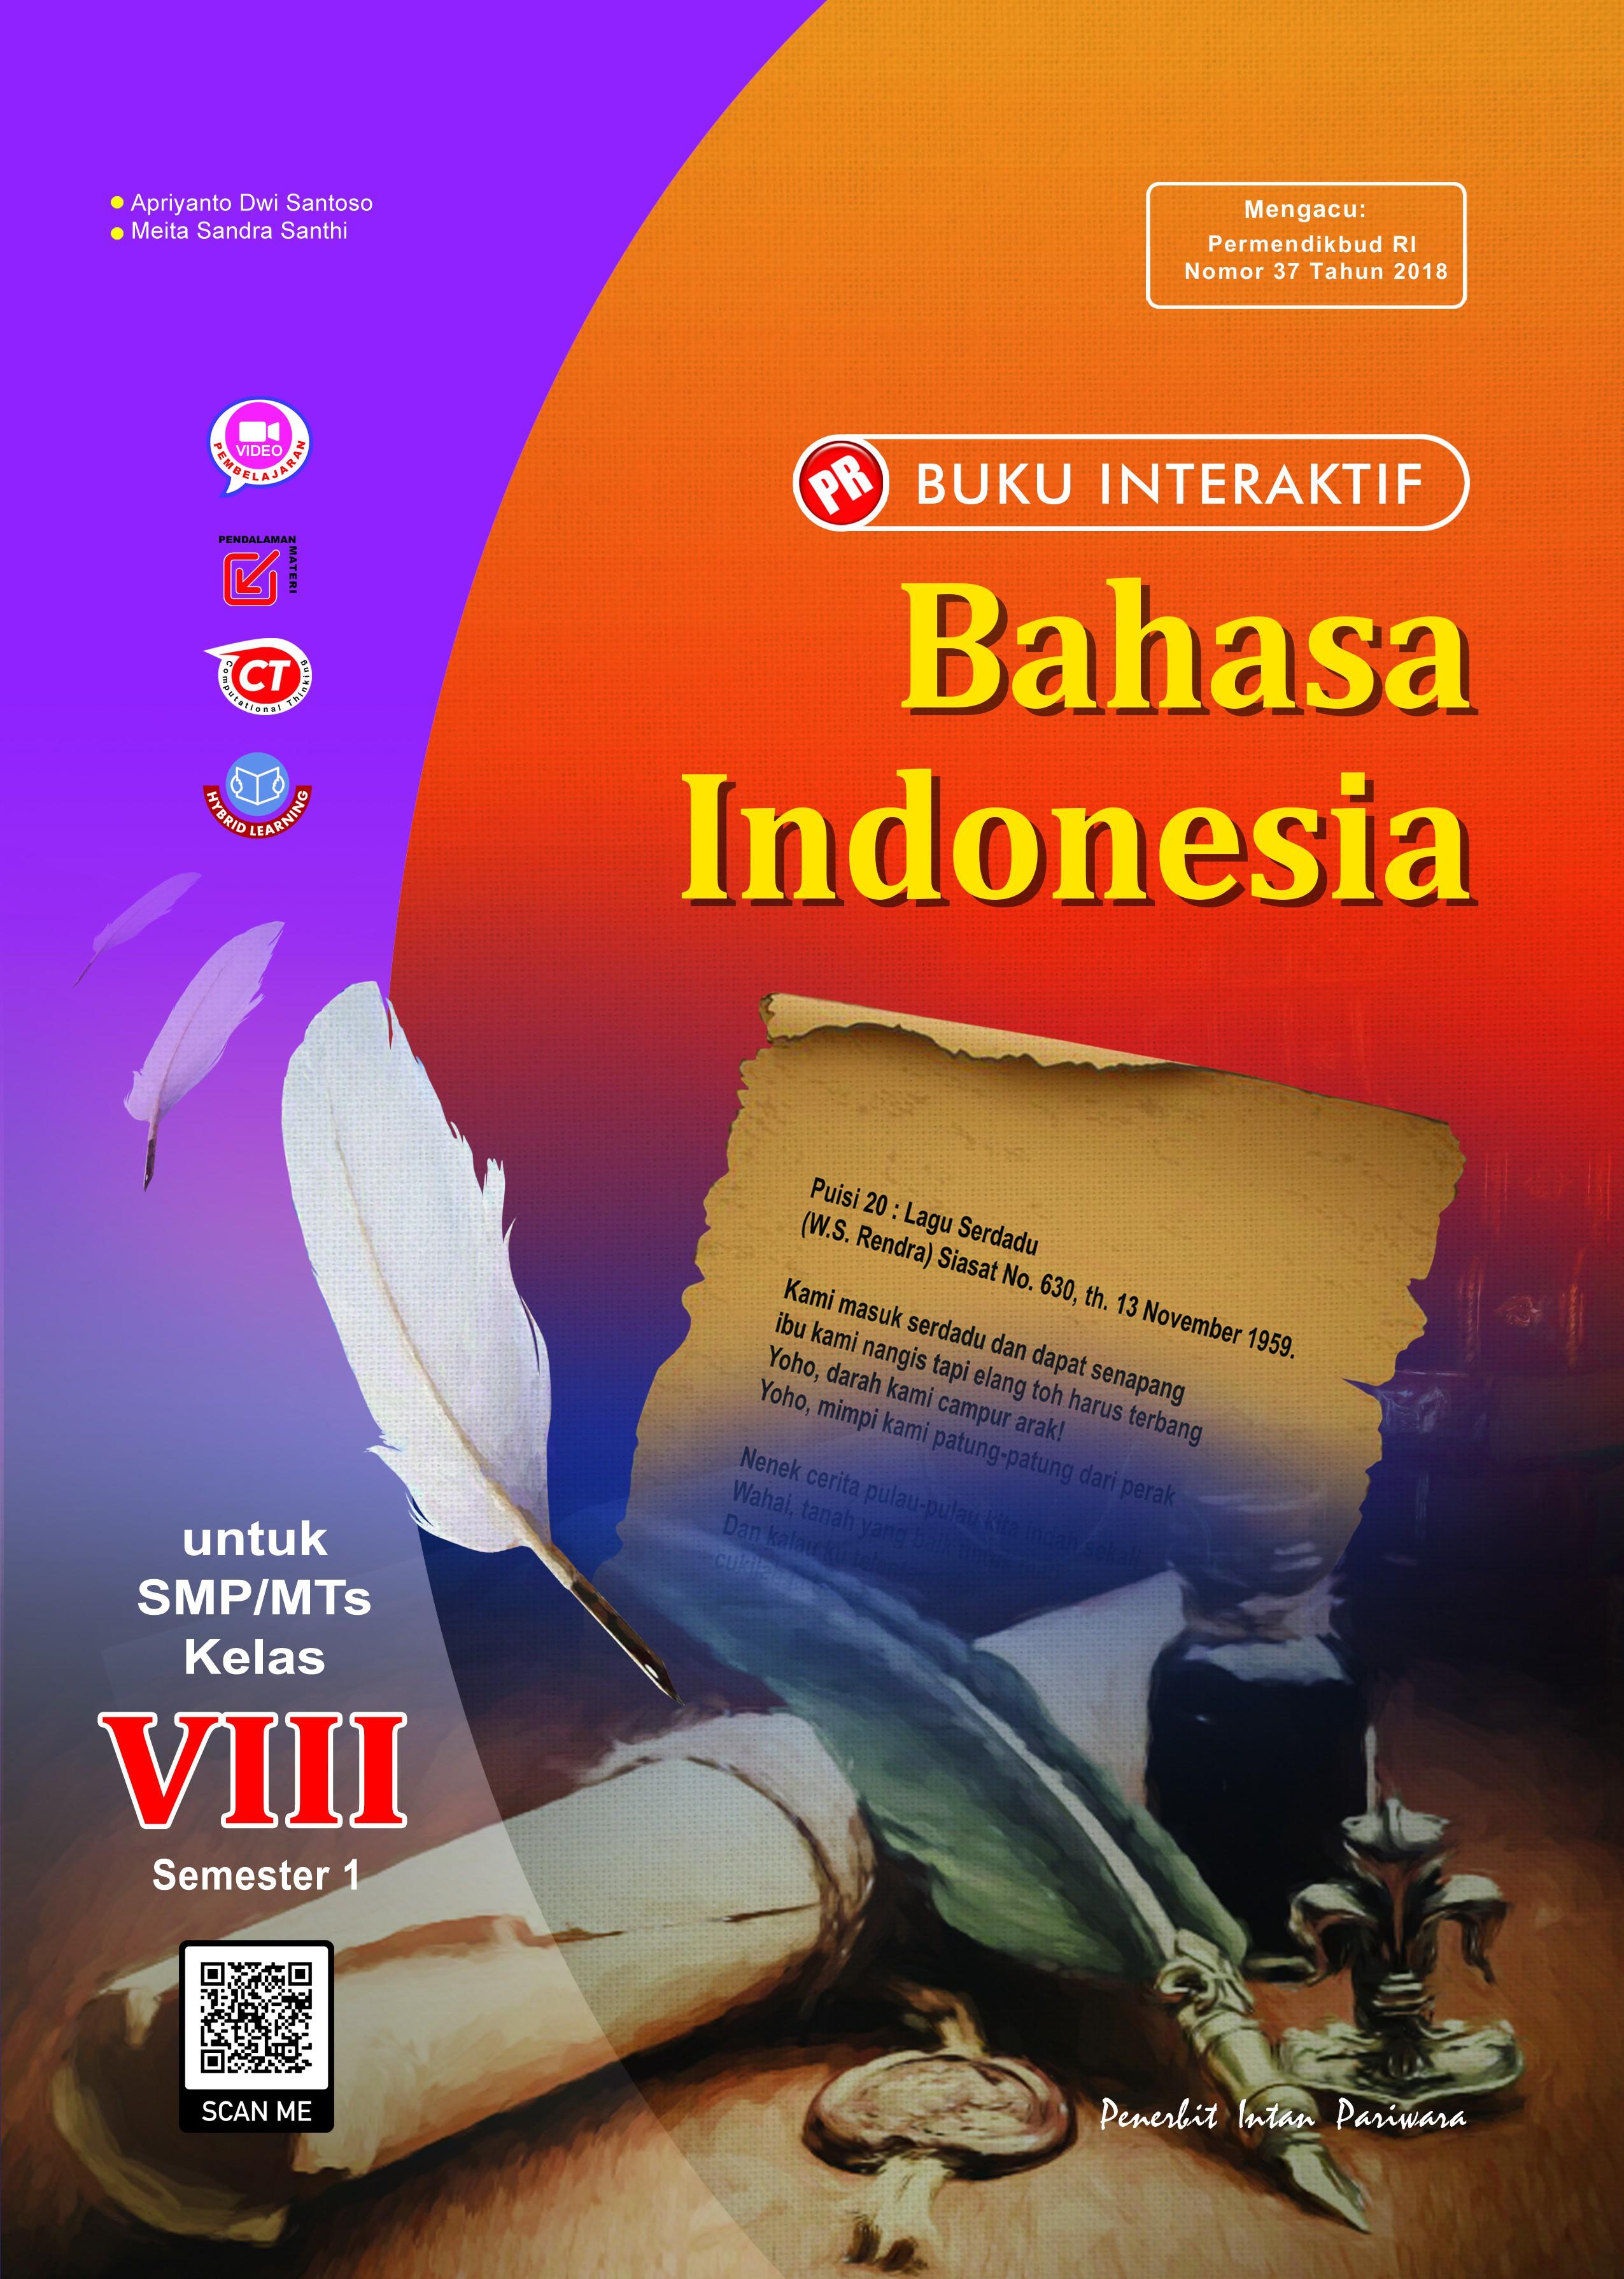 Buku Interaktif Bahasa Indonesia VIII Semester 1